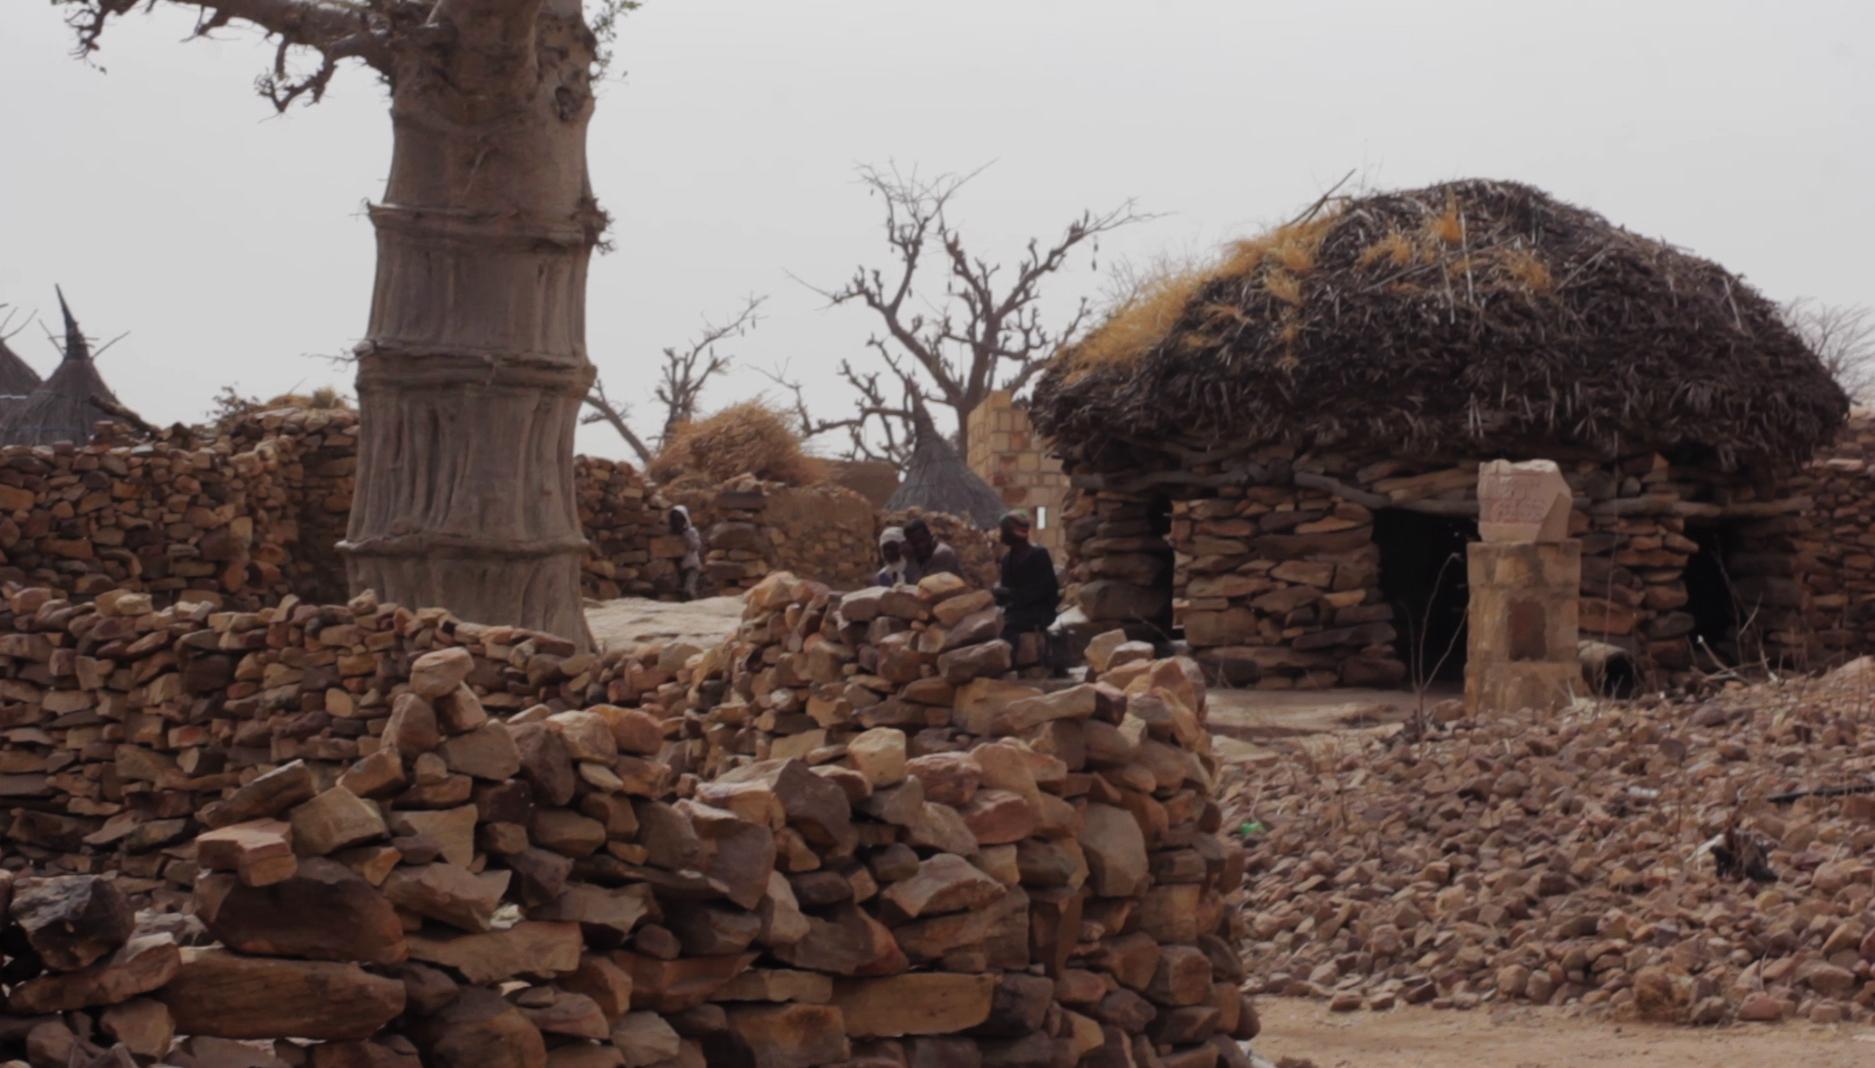 toguina hombres pablocaminante - Malí 5, País Dogon II: Djiguibombó